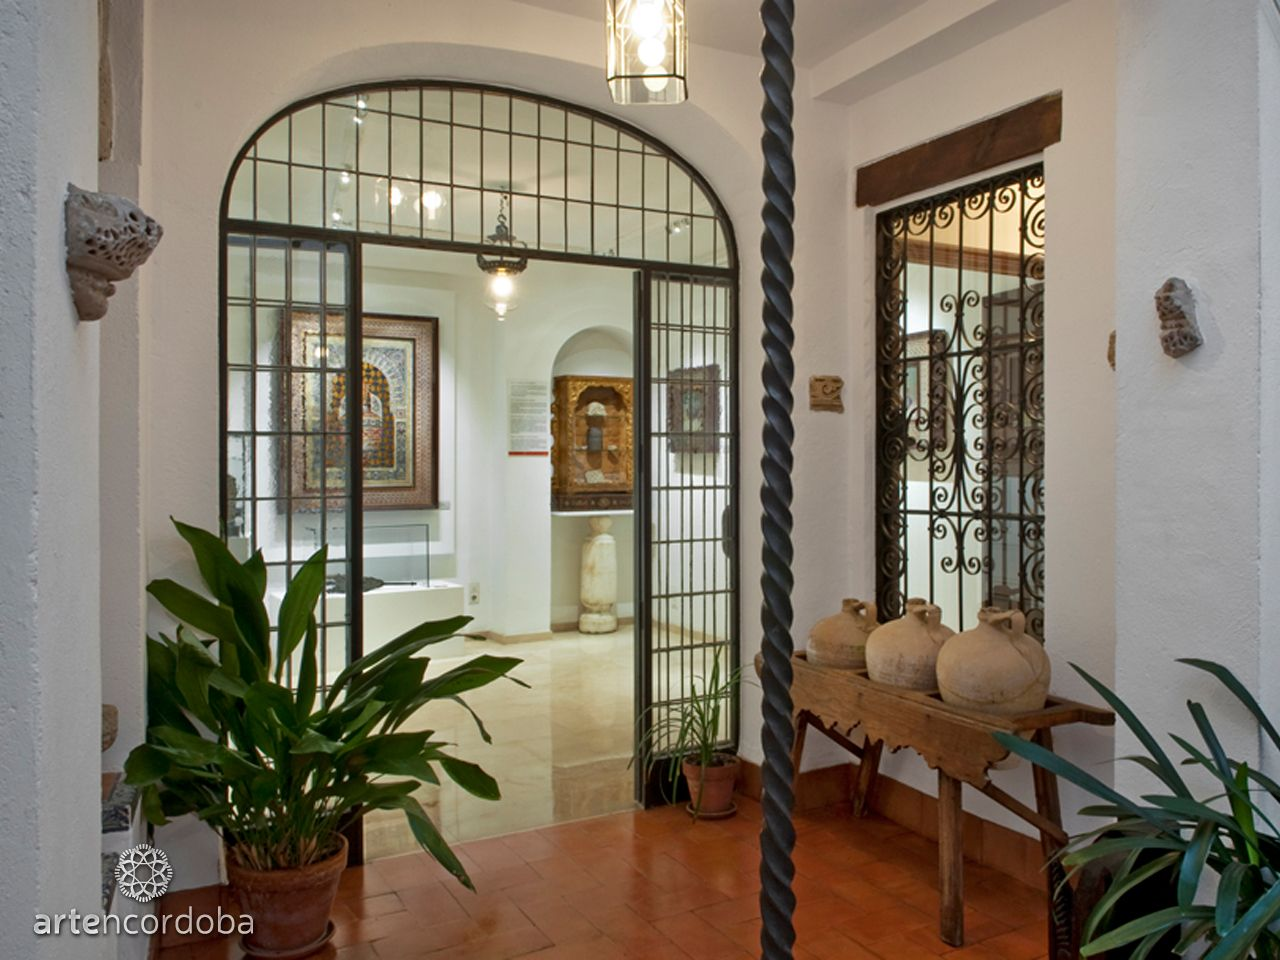 Córdoba༺♥༻Casa Museo Arte sobre Piel de Historia, salas, obras singulares,